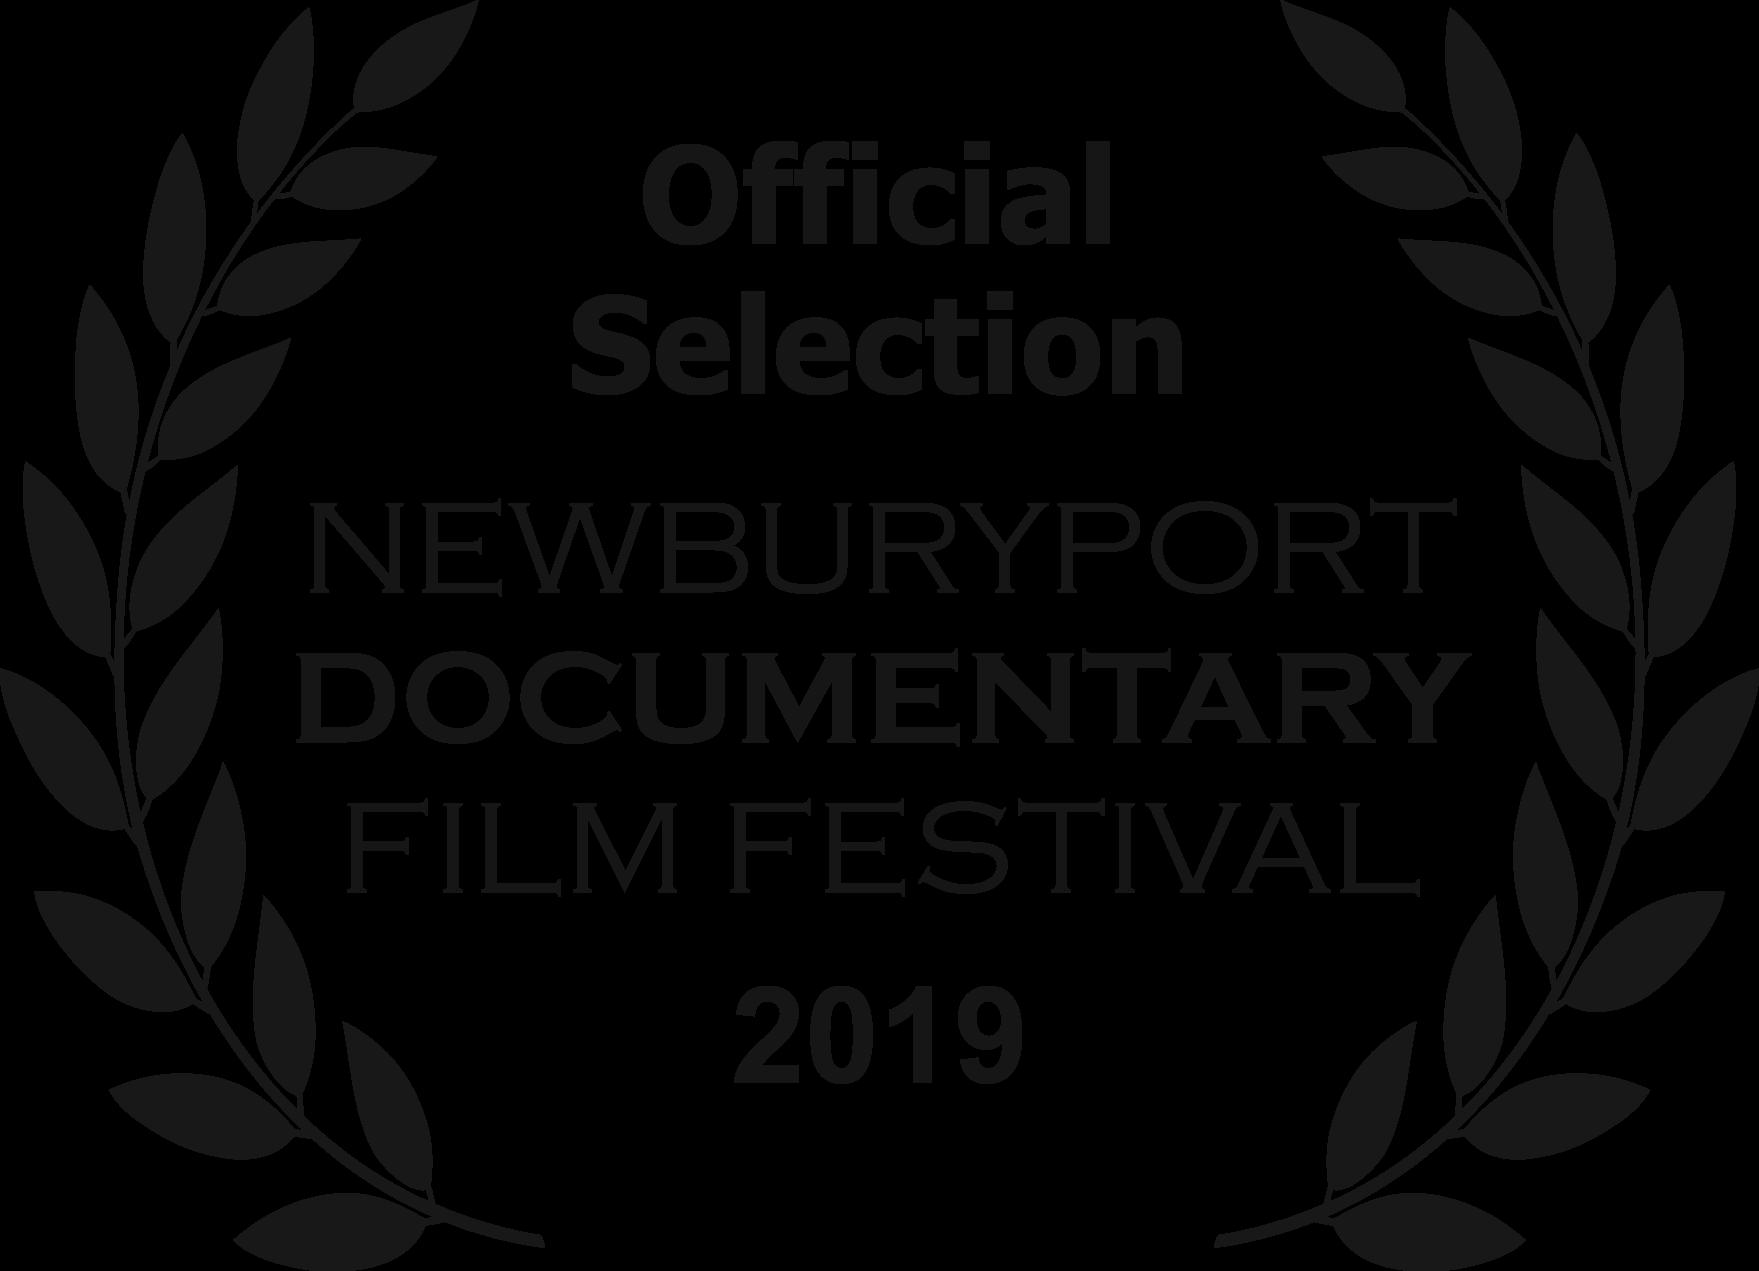 NewburyportDocFF_2019_OfficialSelection.png